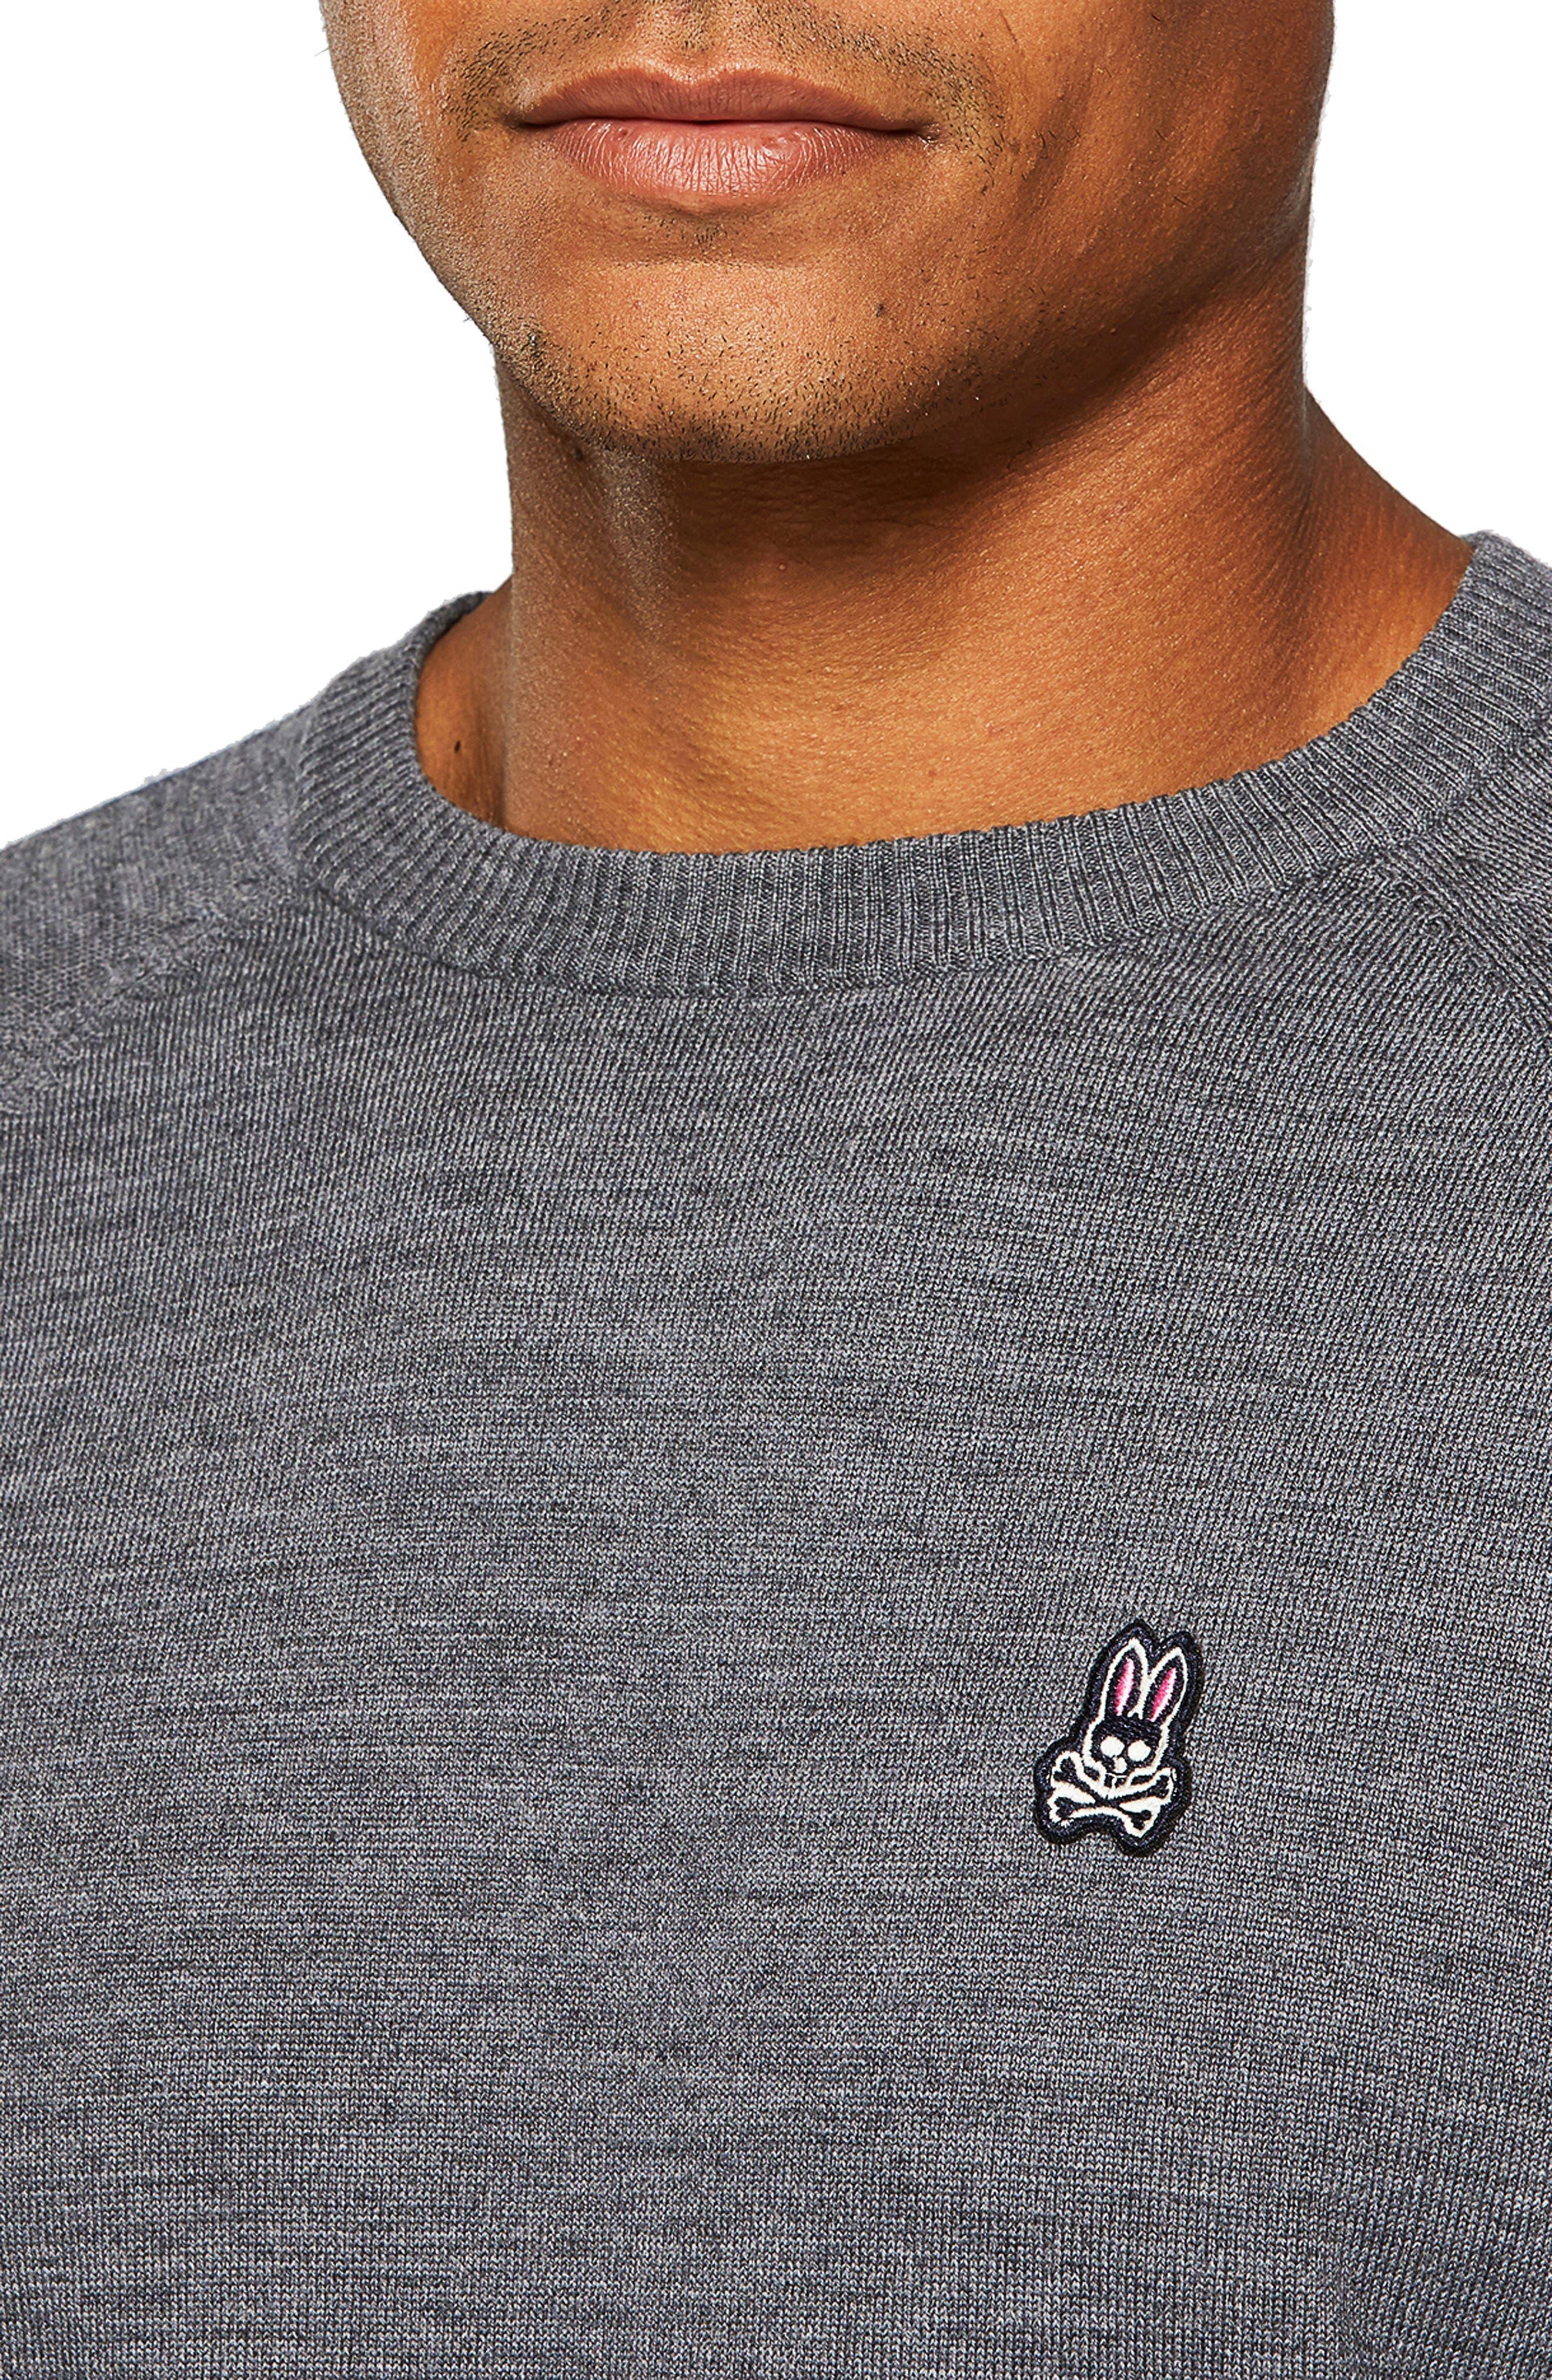 PSYCHO BUNNY,                             Raglan Merino Wool Sweater,                             Alternate thumbnail 3, color,                             HEATHER GREY